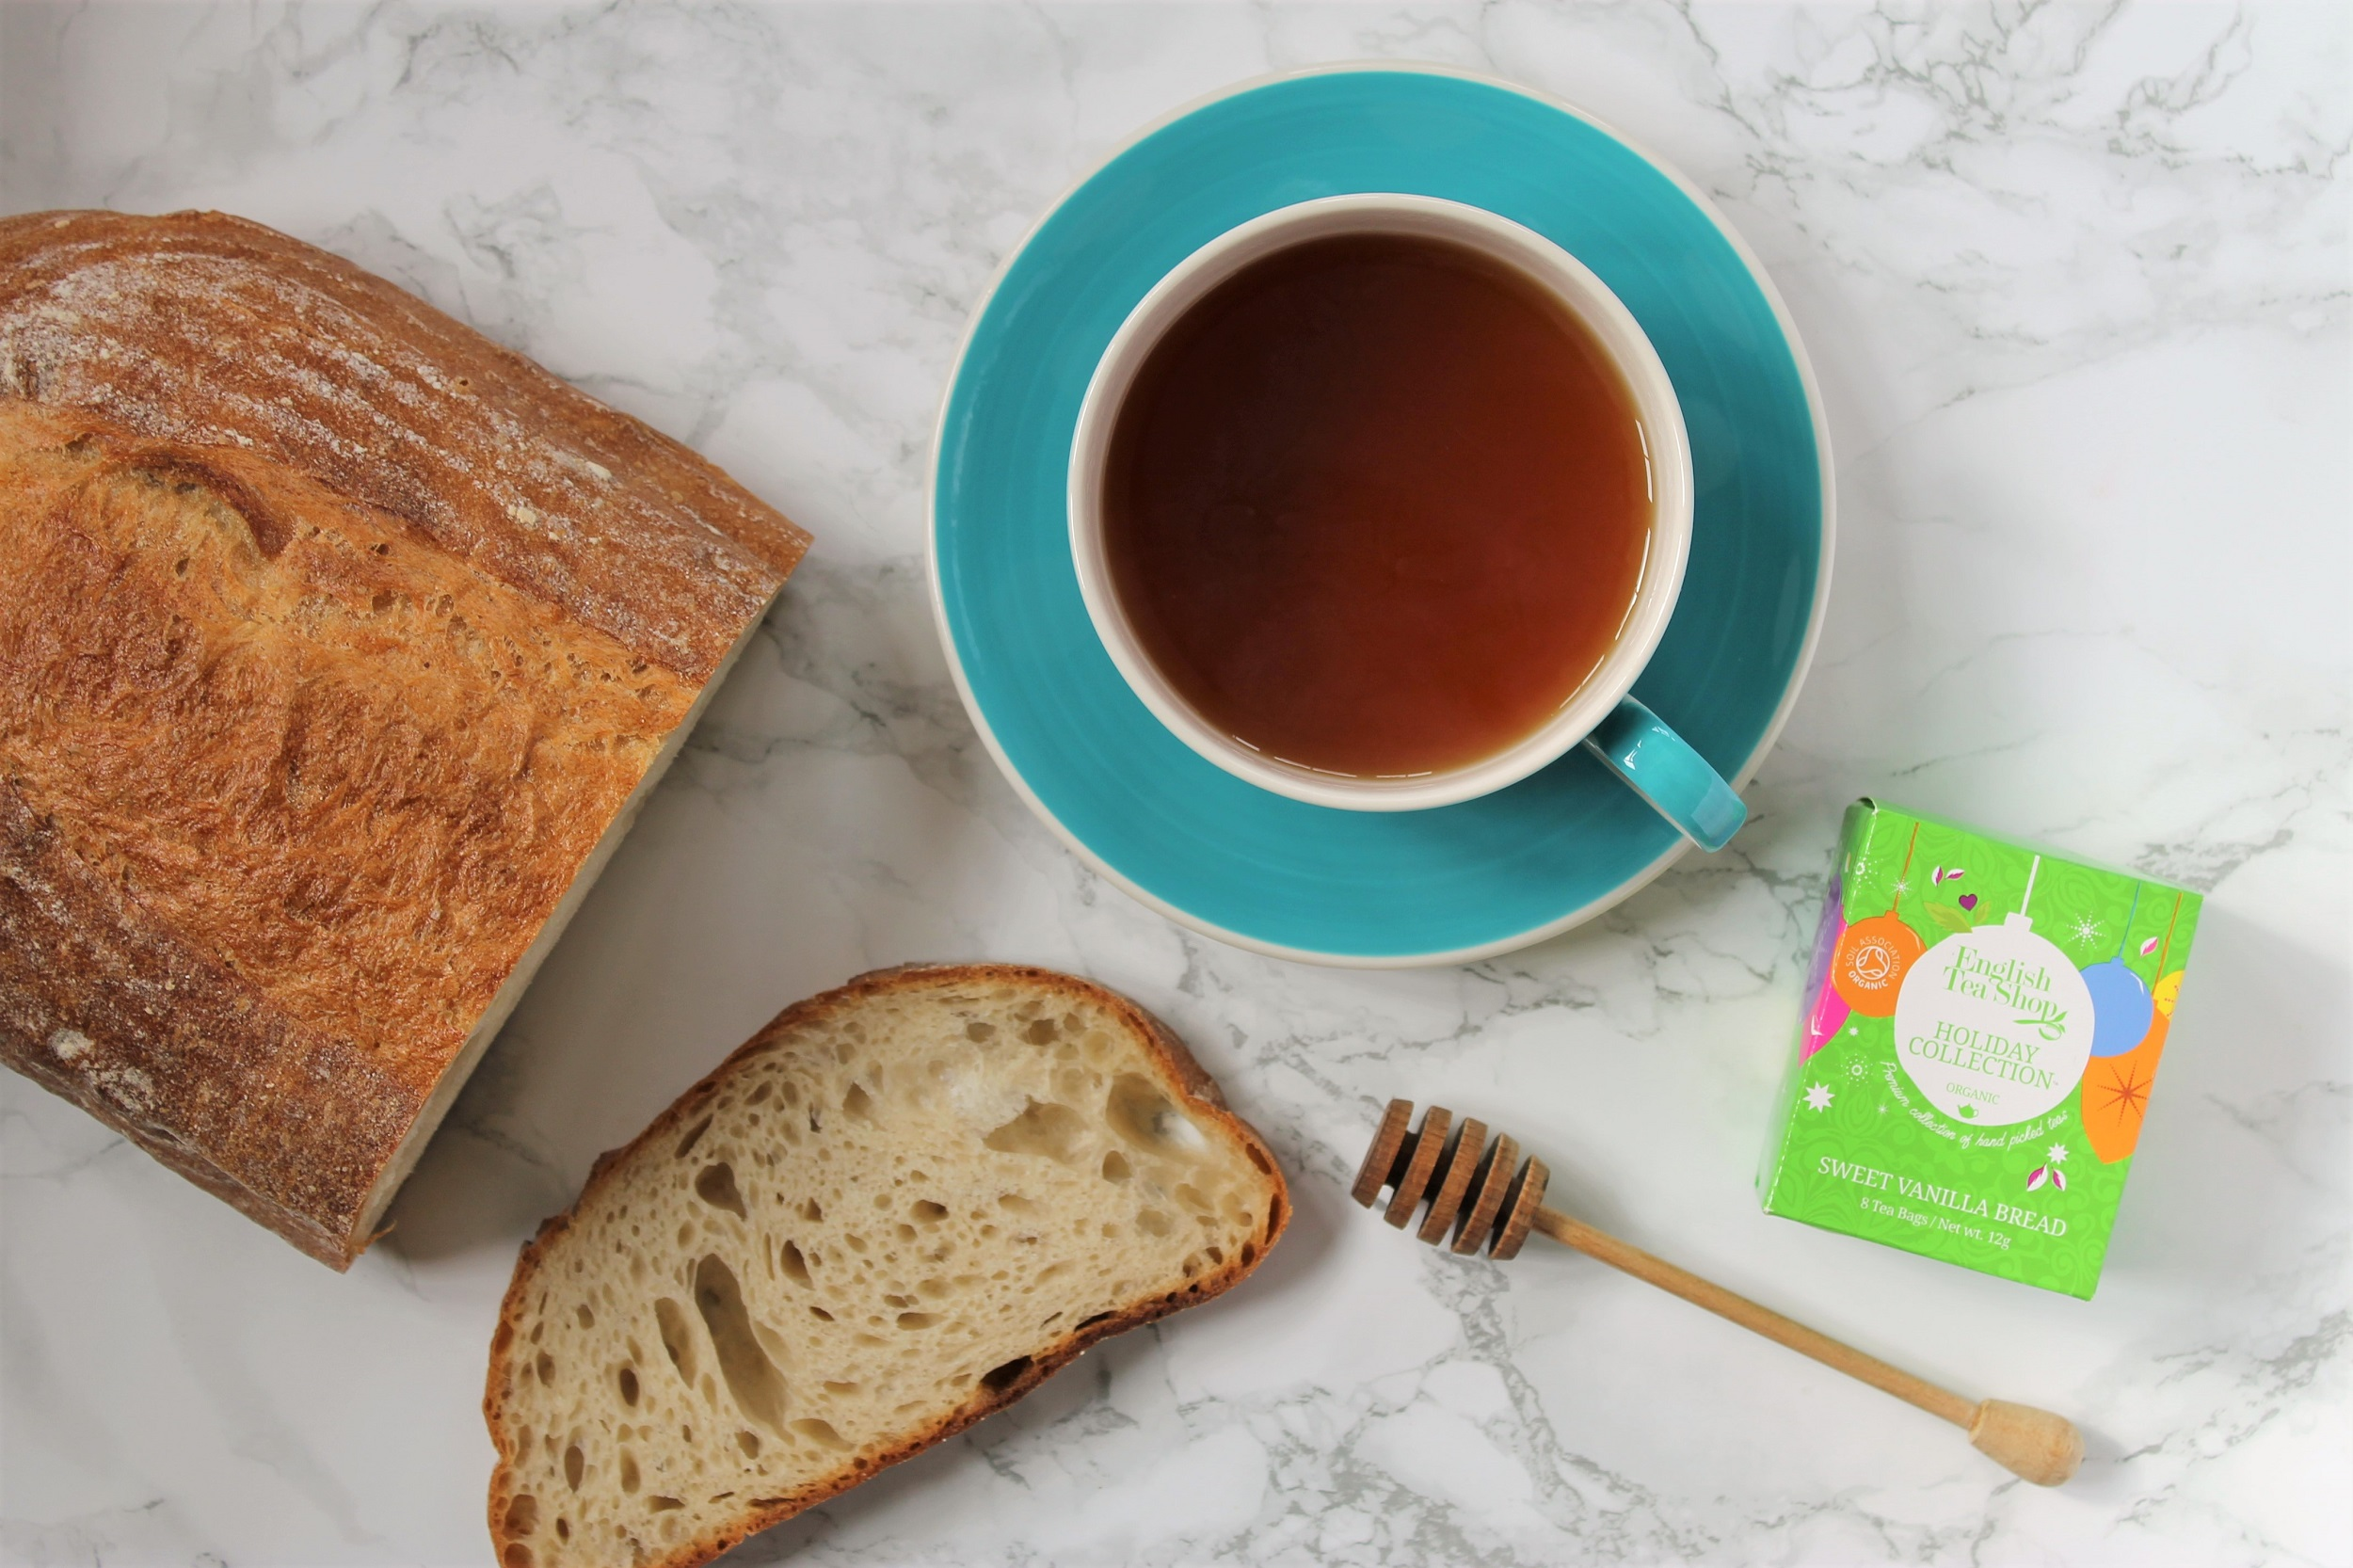 English Tea Shop Sweet Vanilla Bread Tea Review